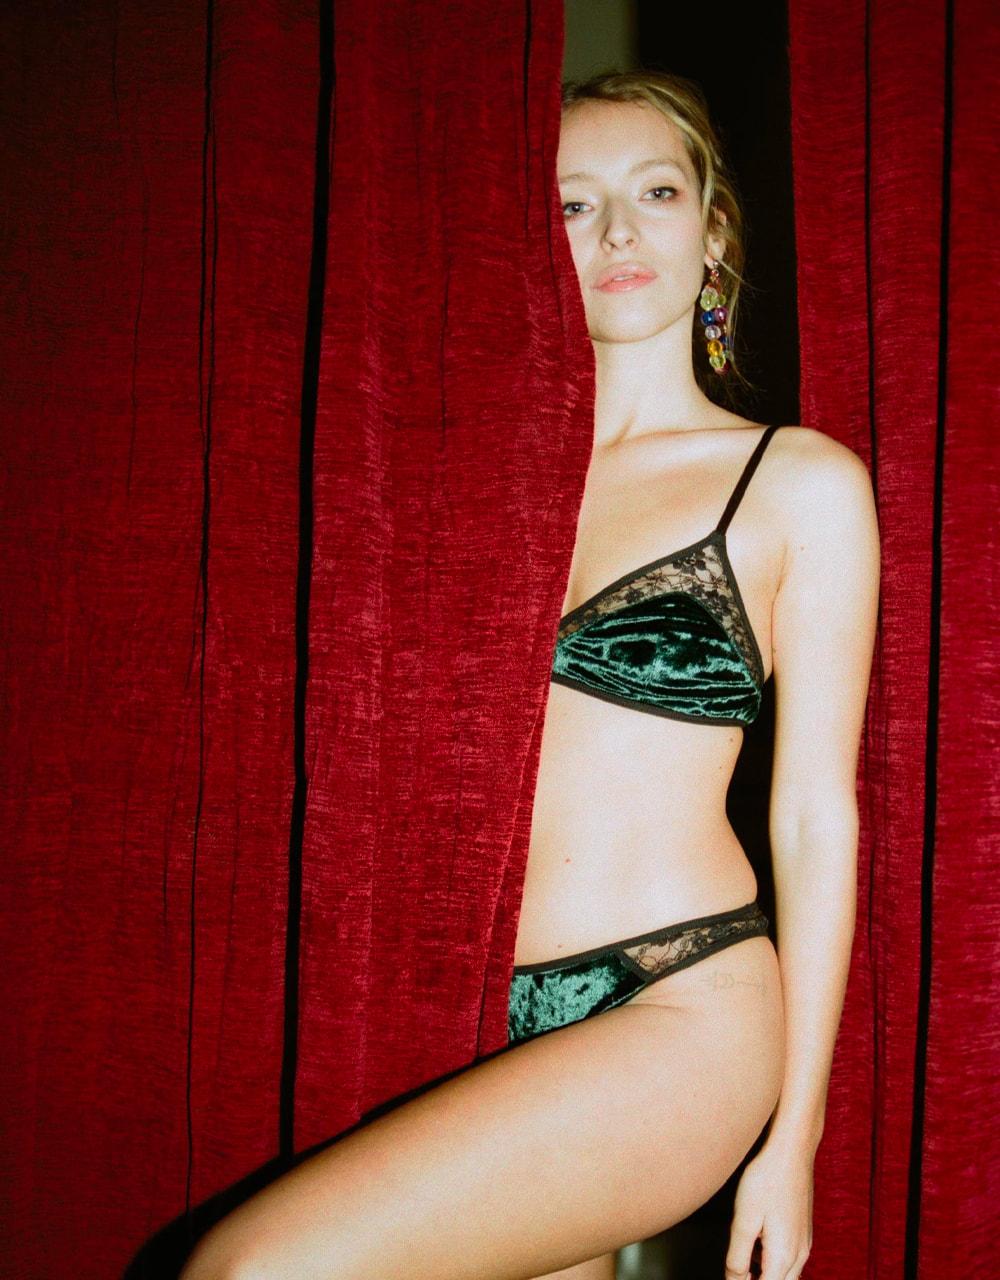 lingerie bra without underwires Very Velvet Green Queen 34 € Girls In Paris photo 2